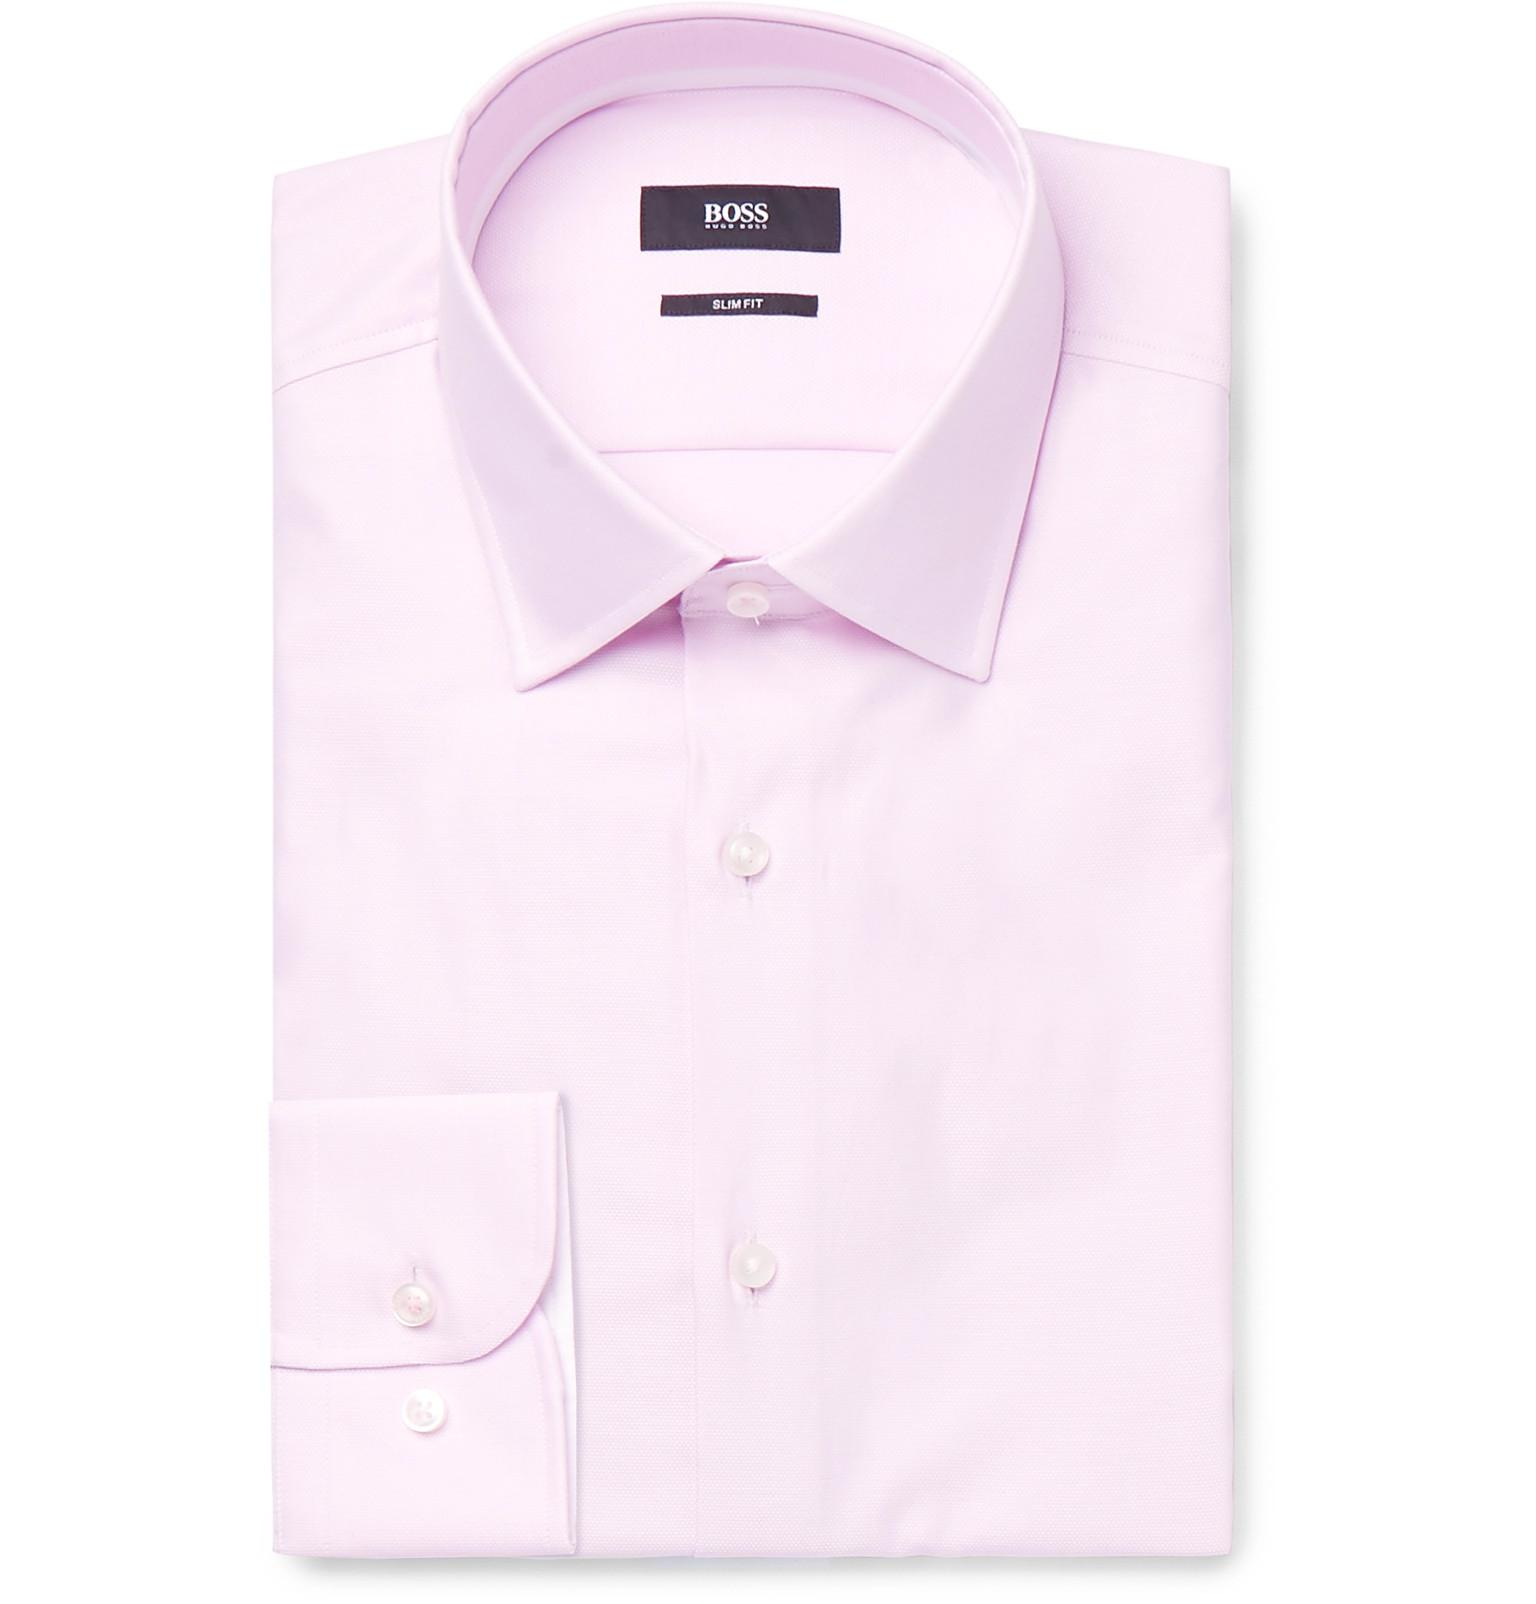 d0b651bae BOSS - Pink Jesse Slim-fit Cotton Oxford Shirt for Men - Lyst. View  fullscreen